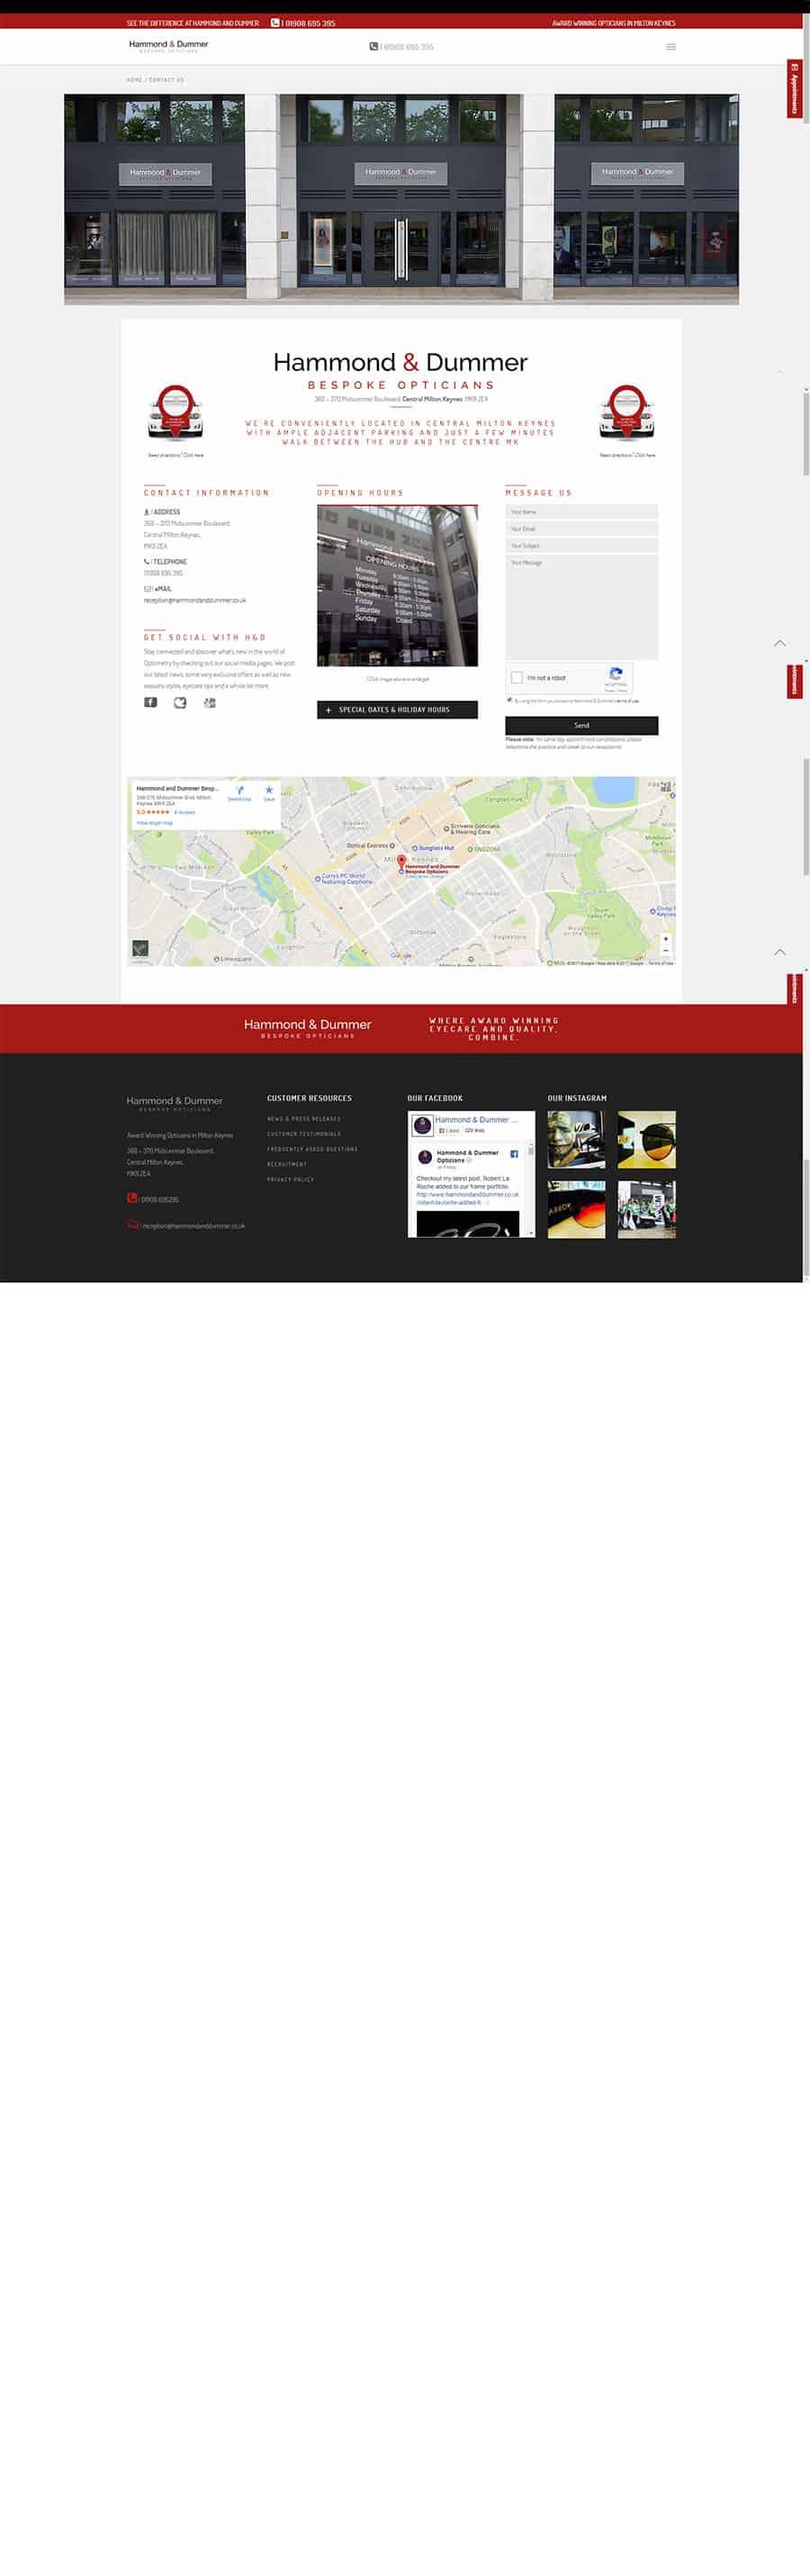 Web design screen capture